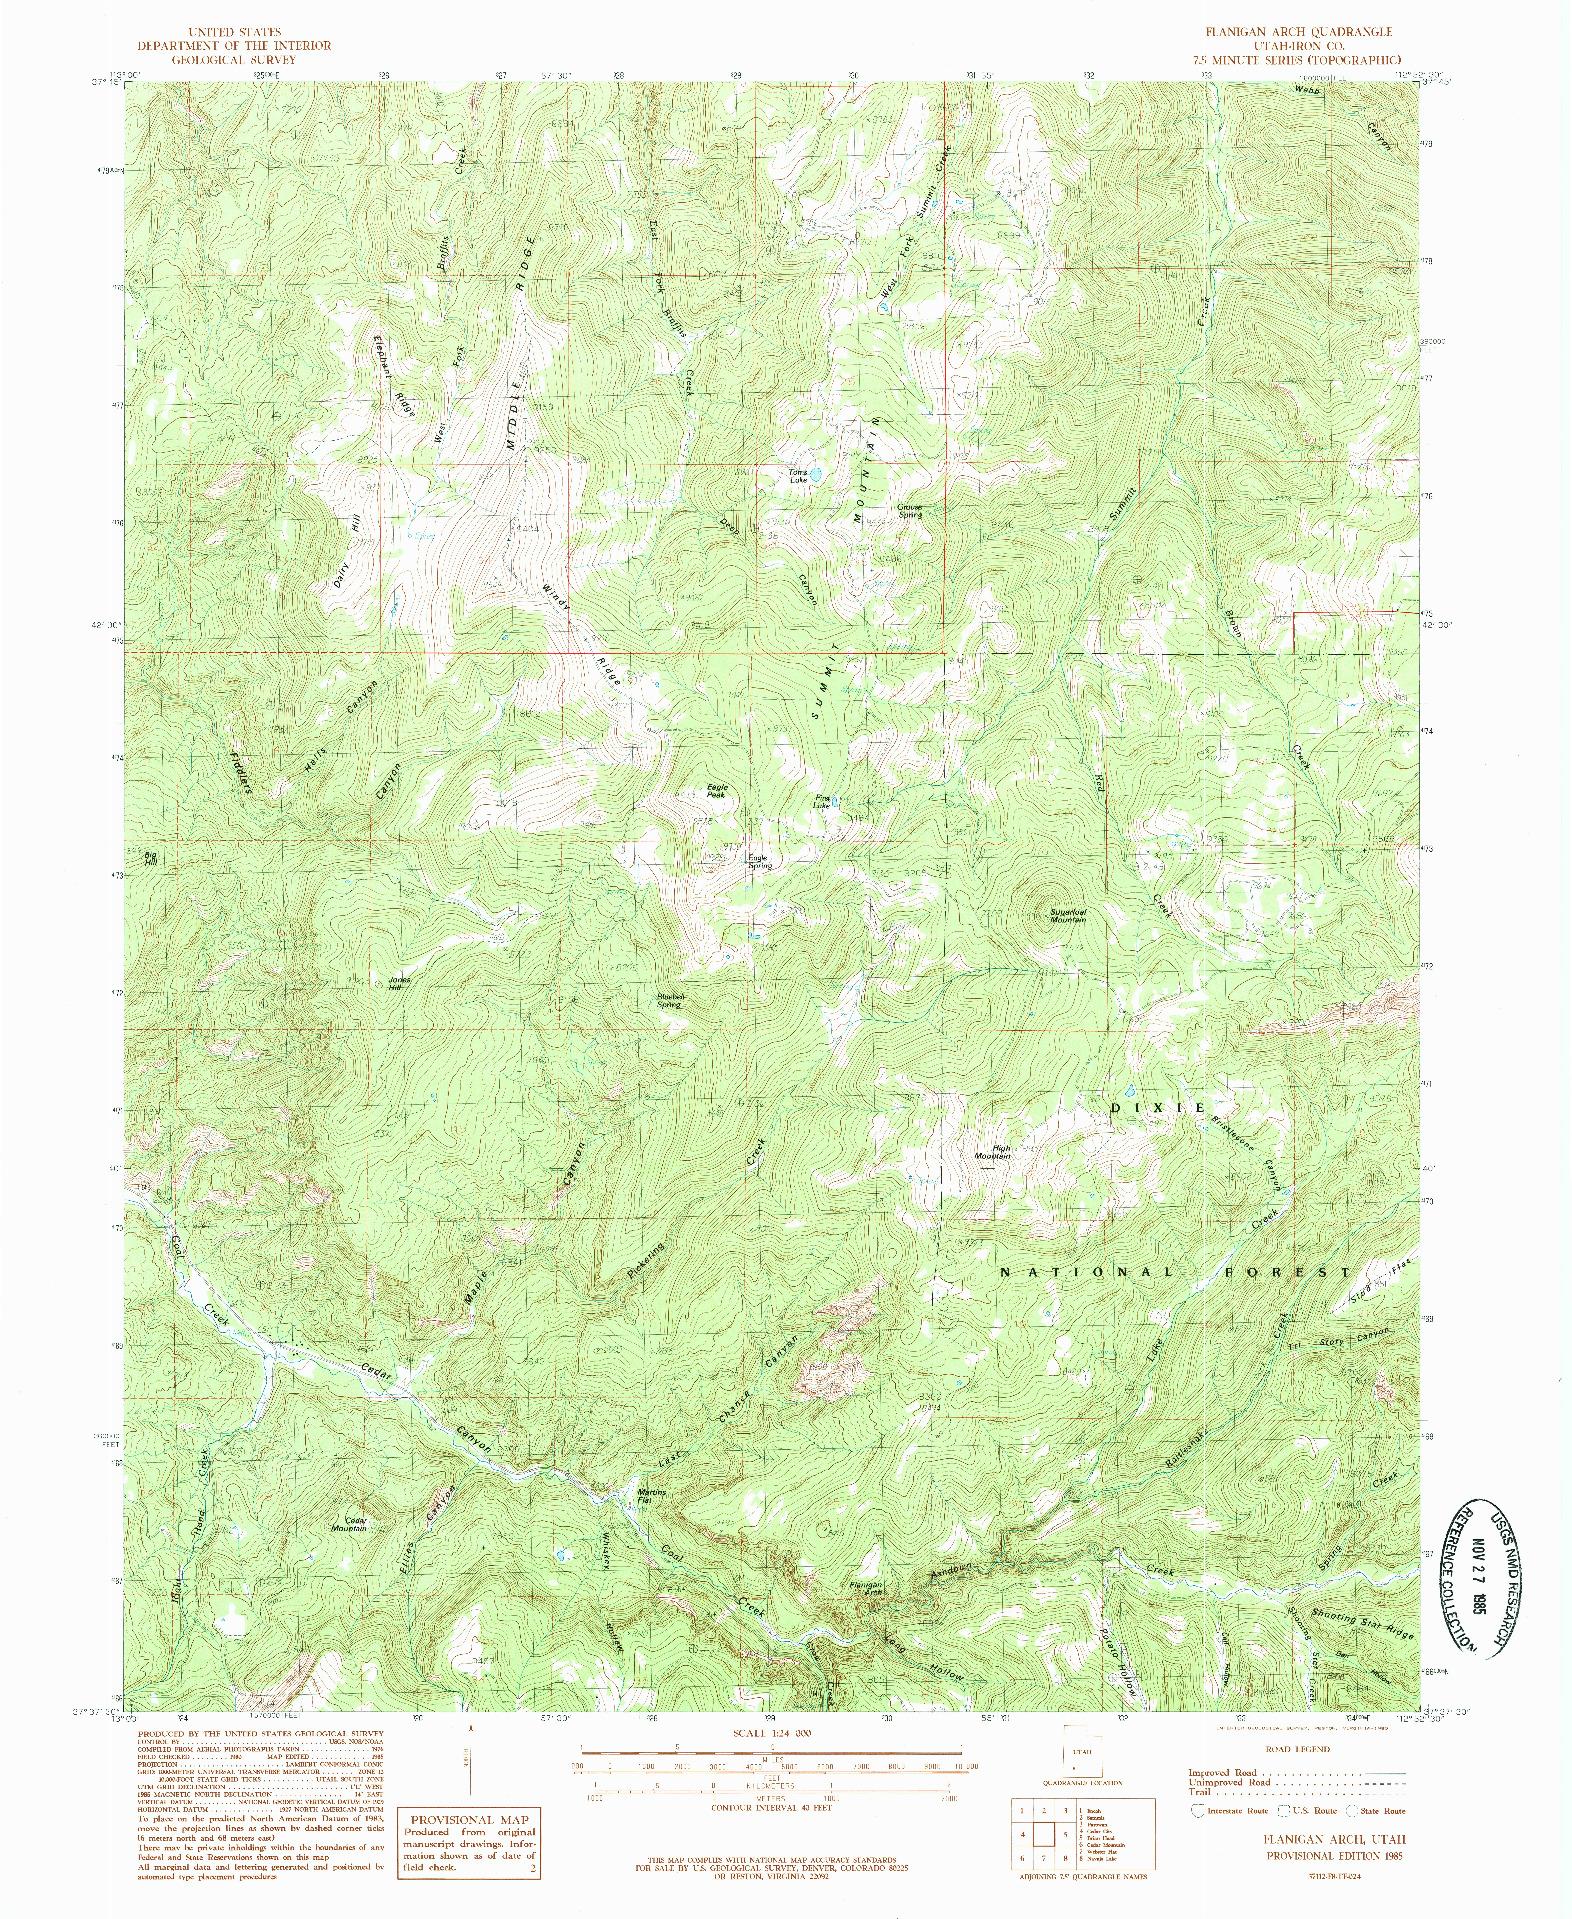 USGS 1:24000-SCALE QUADRANGLE FOR FLANIGAN ARCH, UT 1985